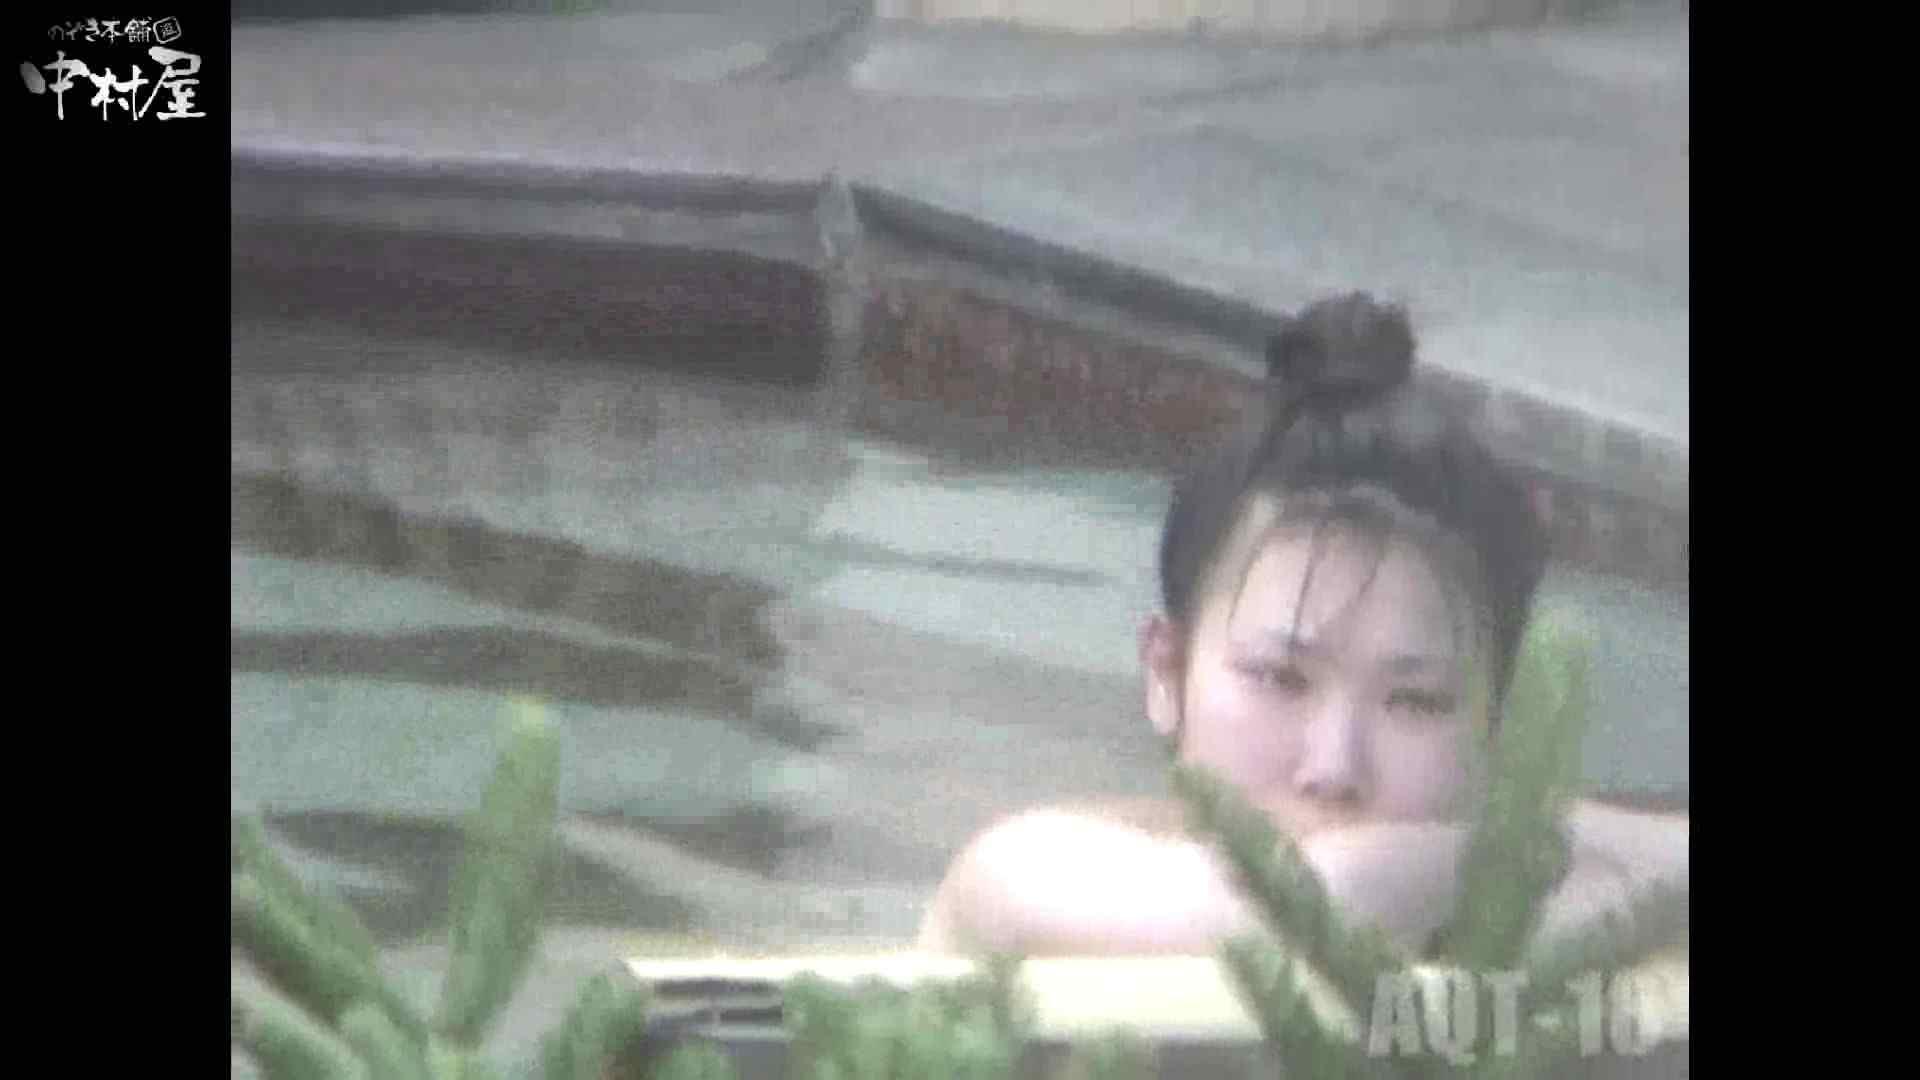 Aquaな露天風呂Vol.882潜入盗撮露天風呂十八判湯 其の二 露天 | 潜入  78PICs 73